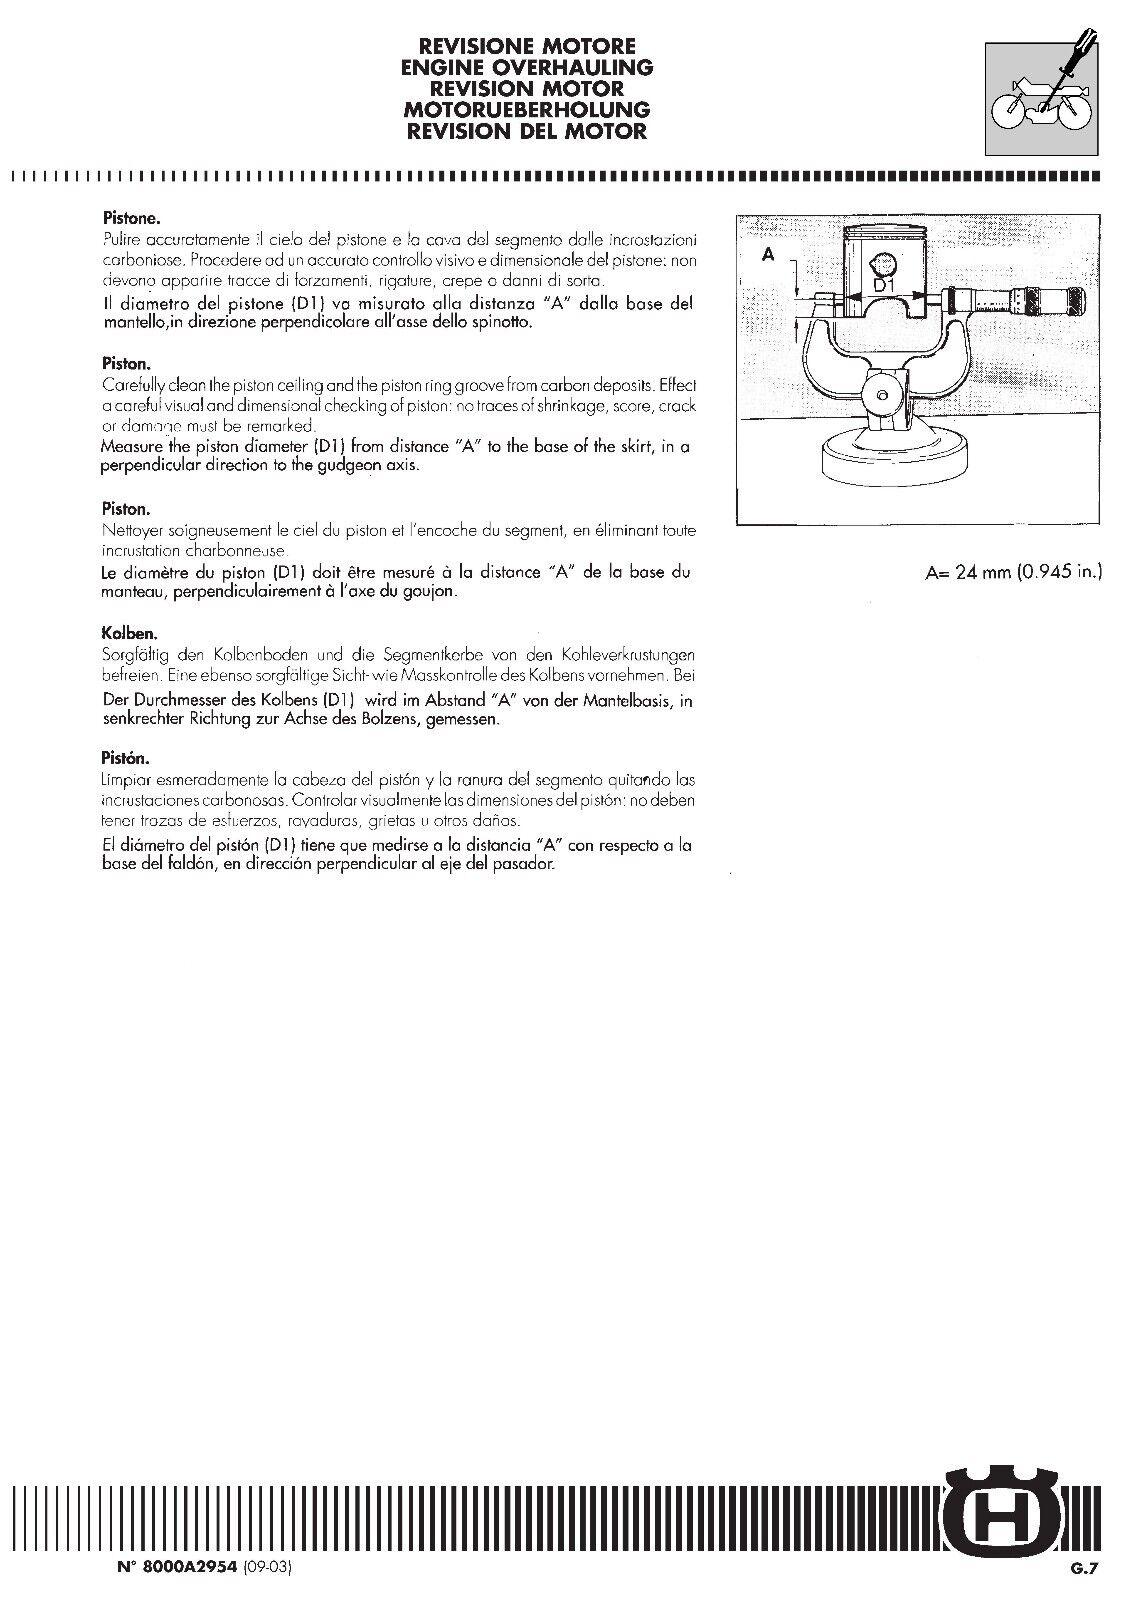 3 of 12 Husqvarna workshop service manual 2004 WR 250 & CR 250